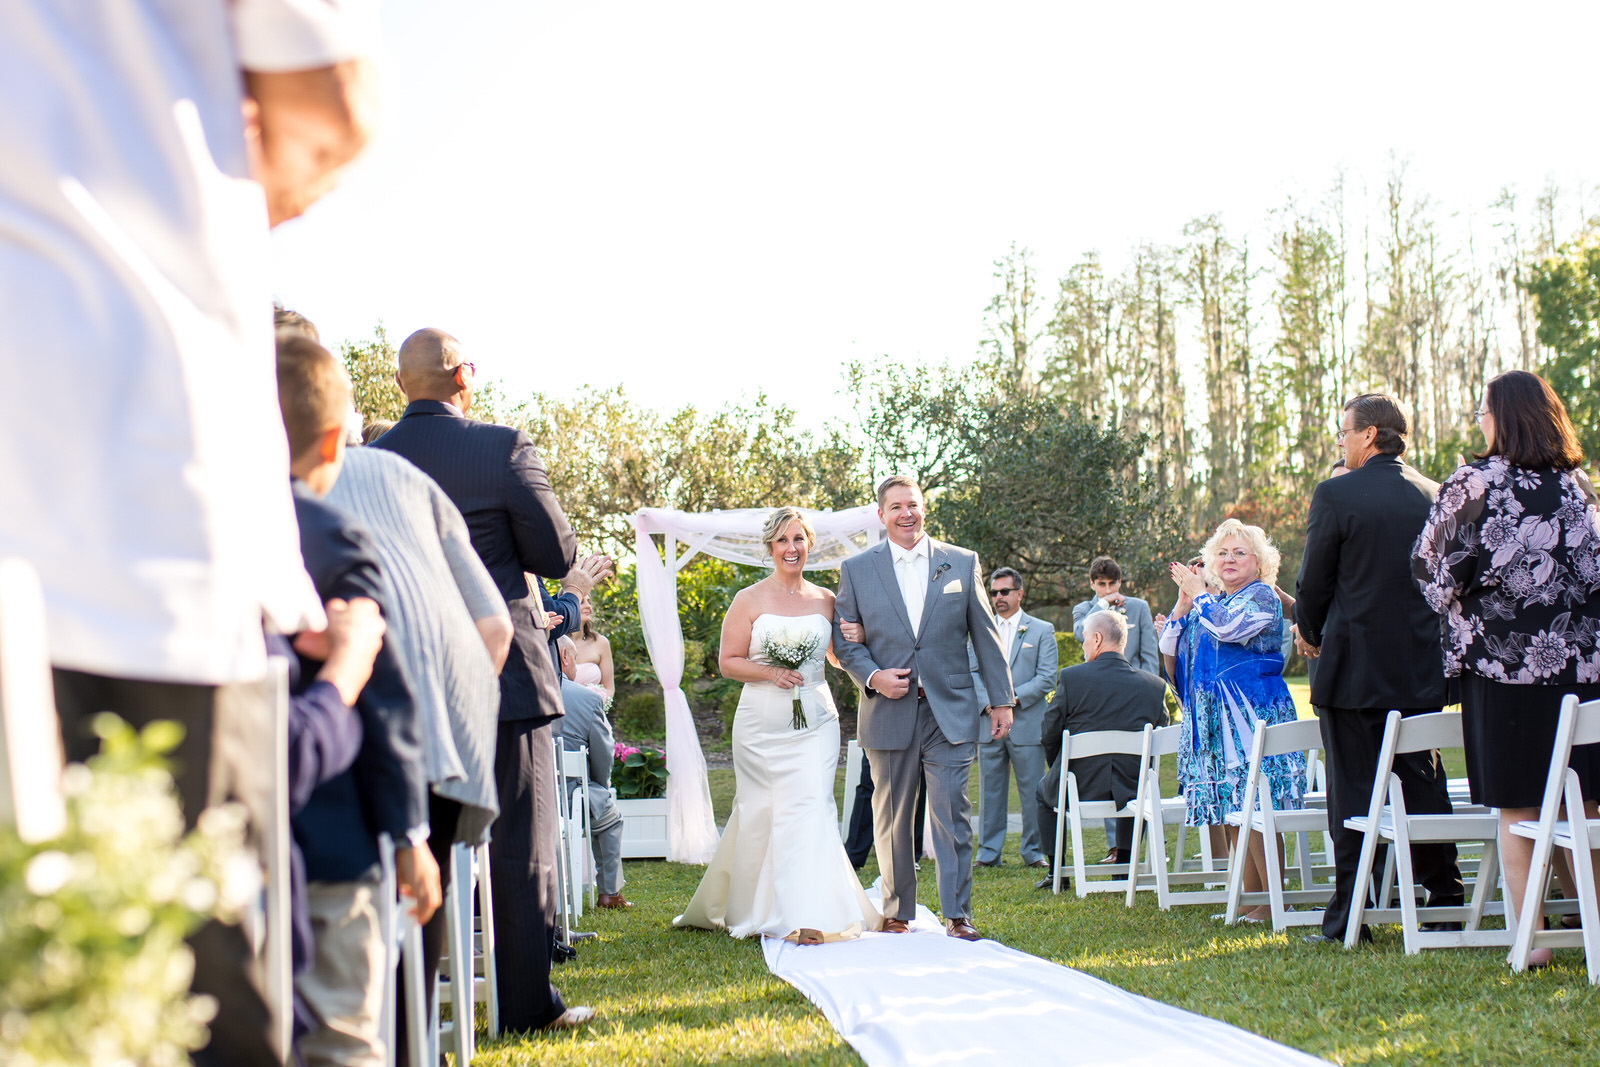 Mike_&_Barbaras_Wedding_3_24_2018-180.jpg